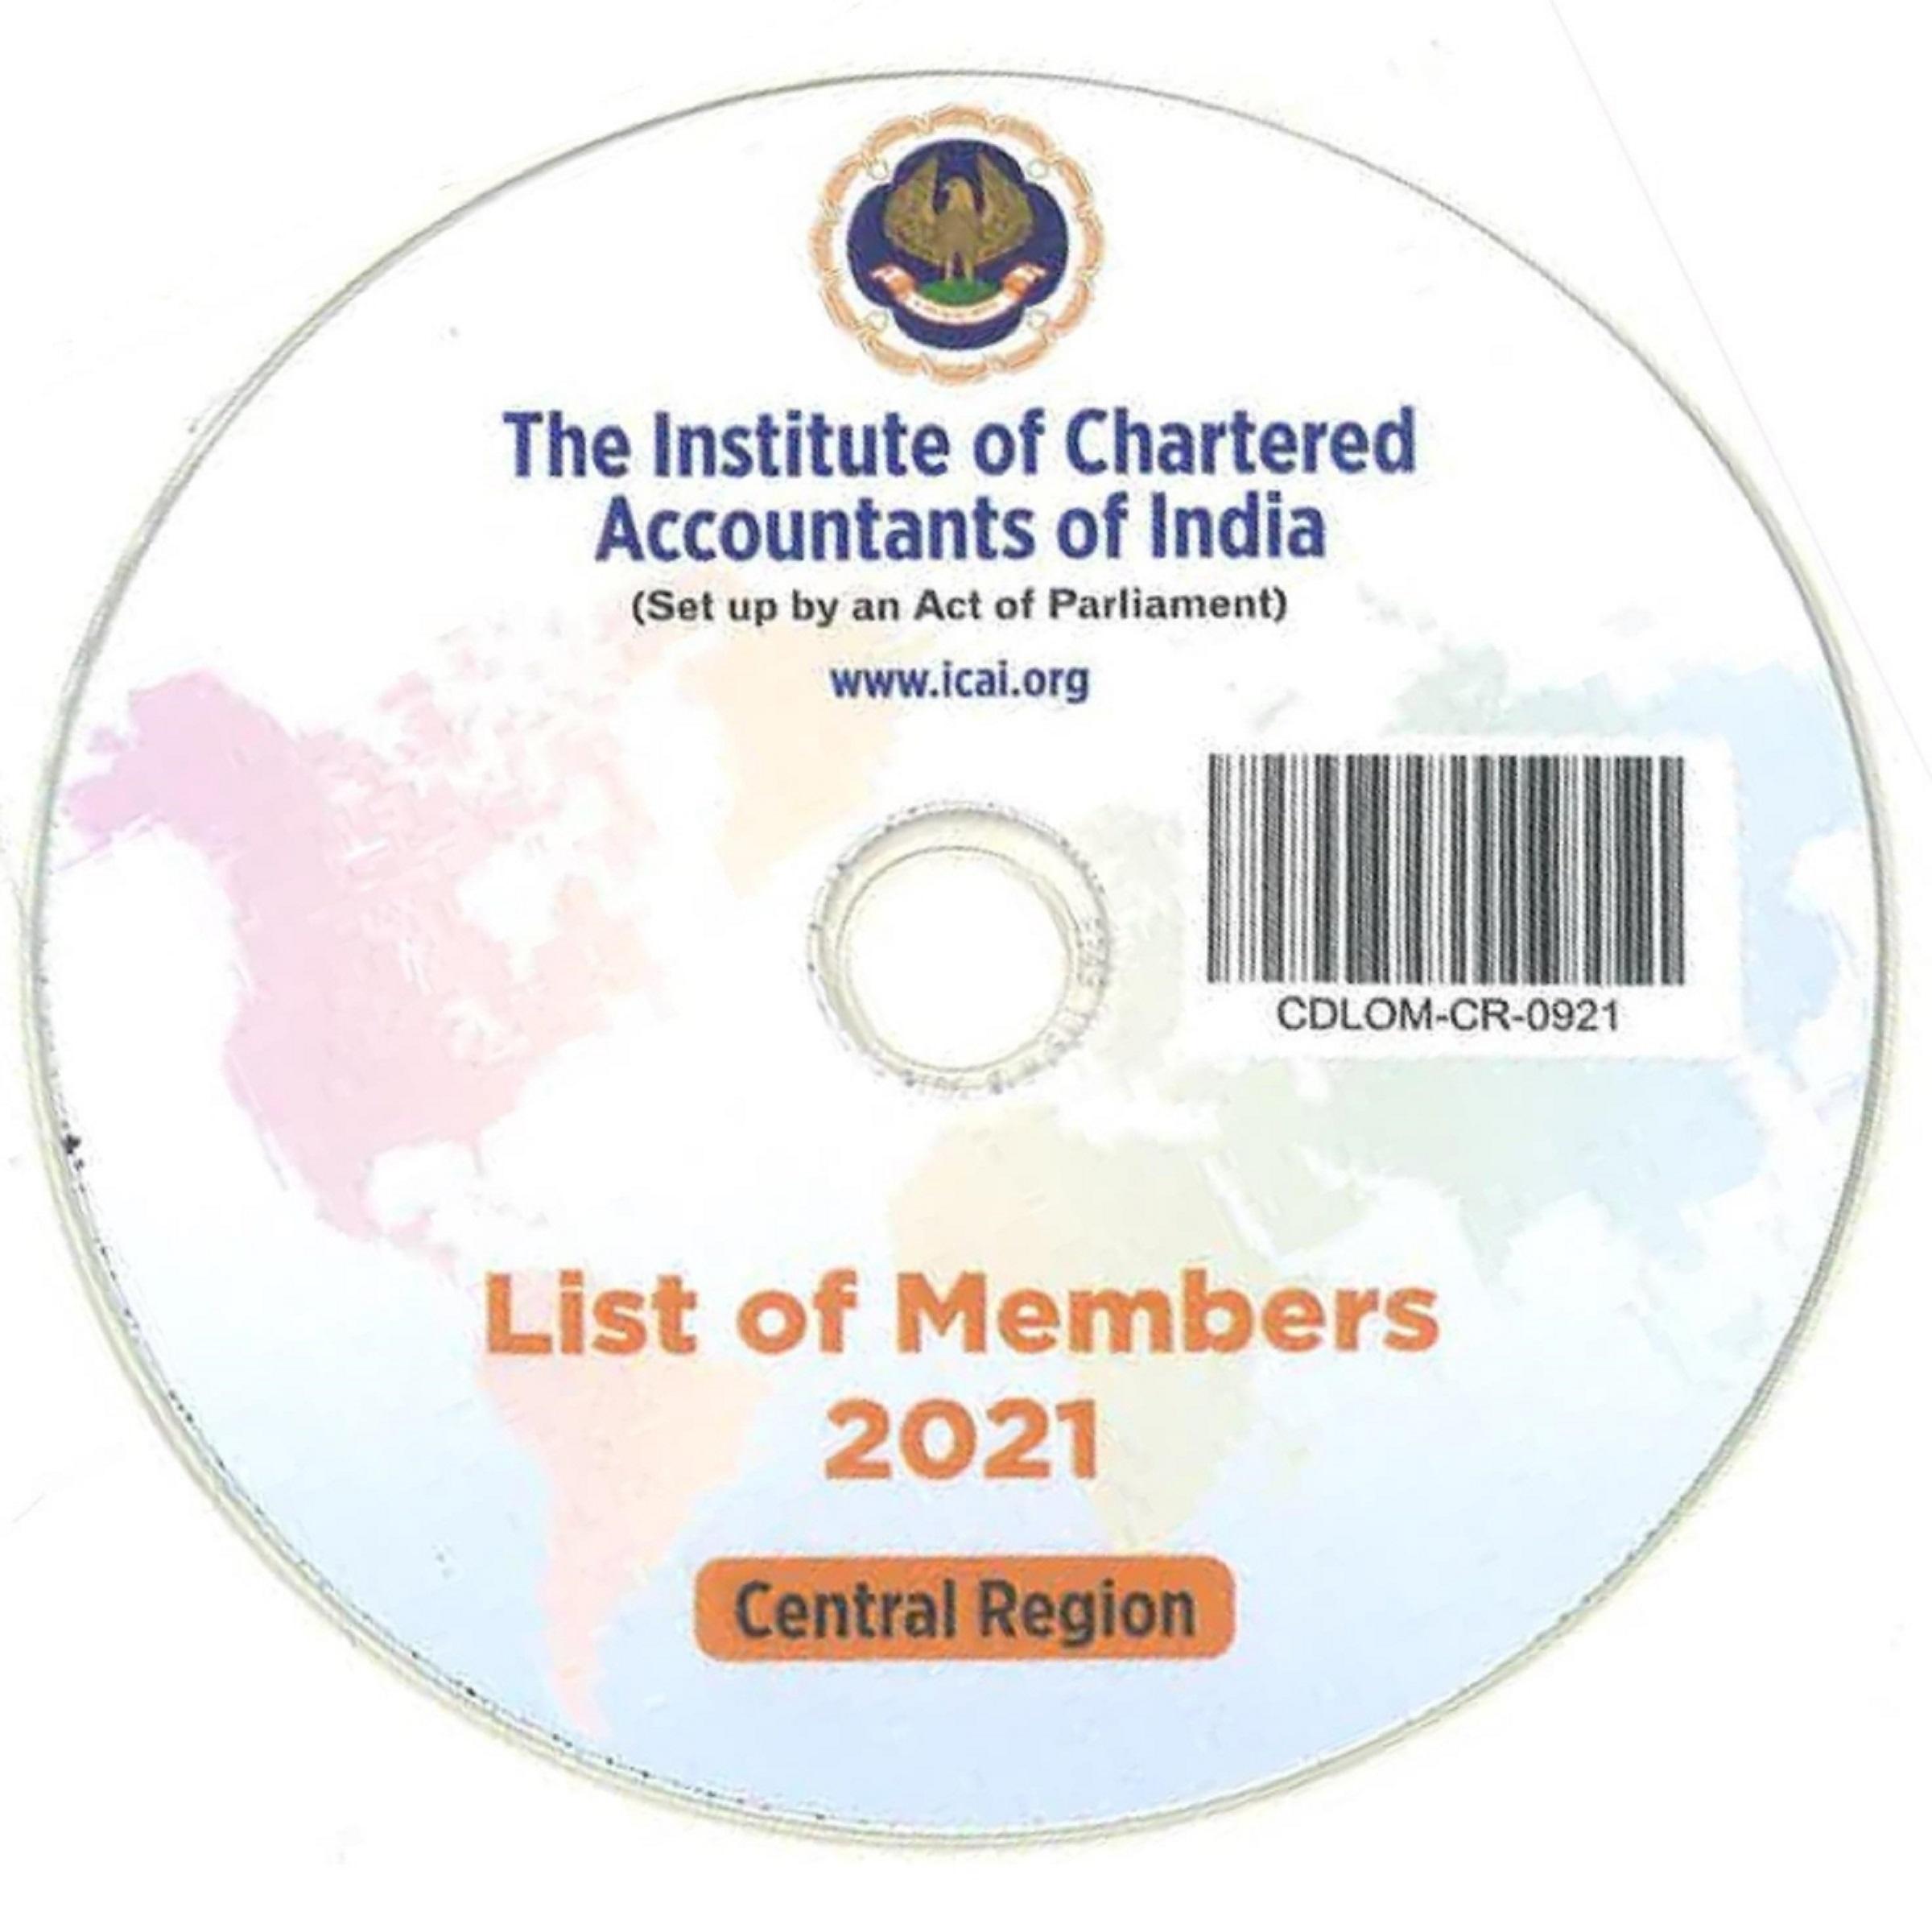 CD-List of Members, 2021 (Central Region)